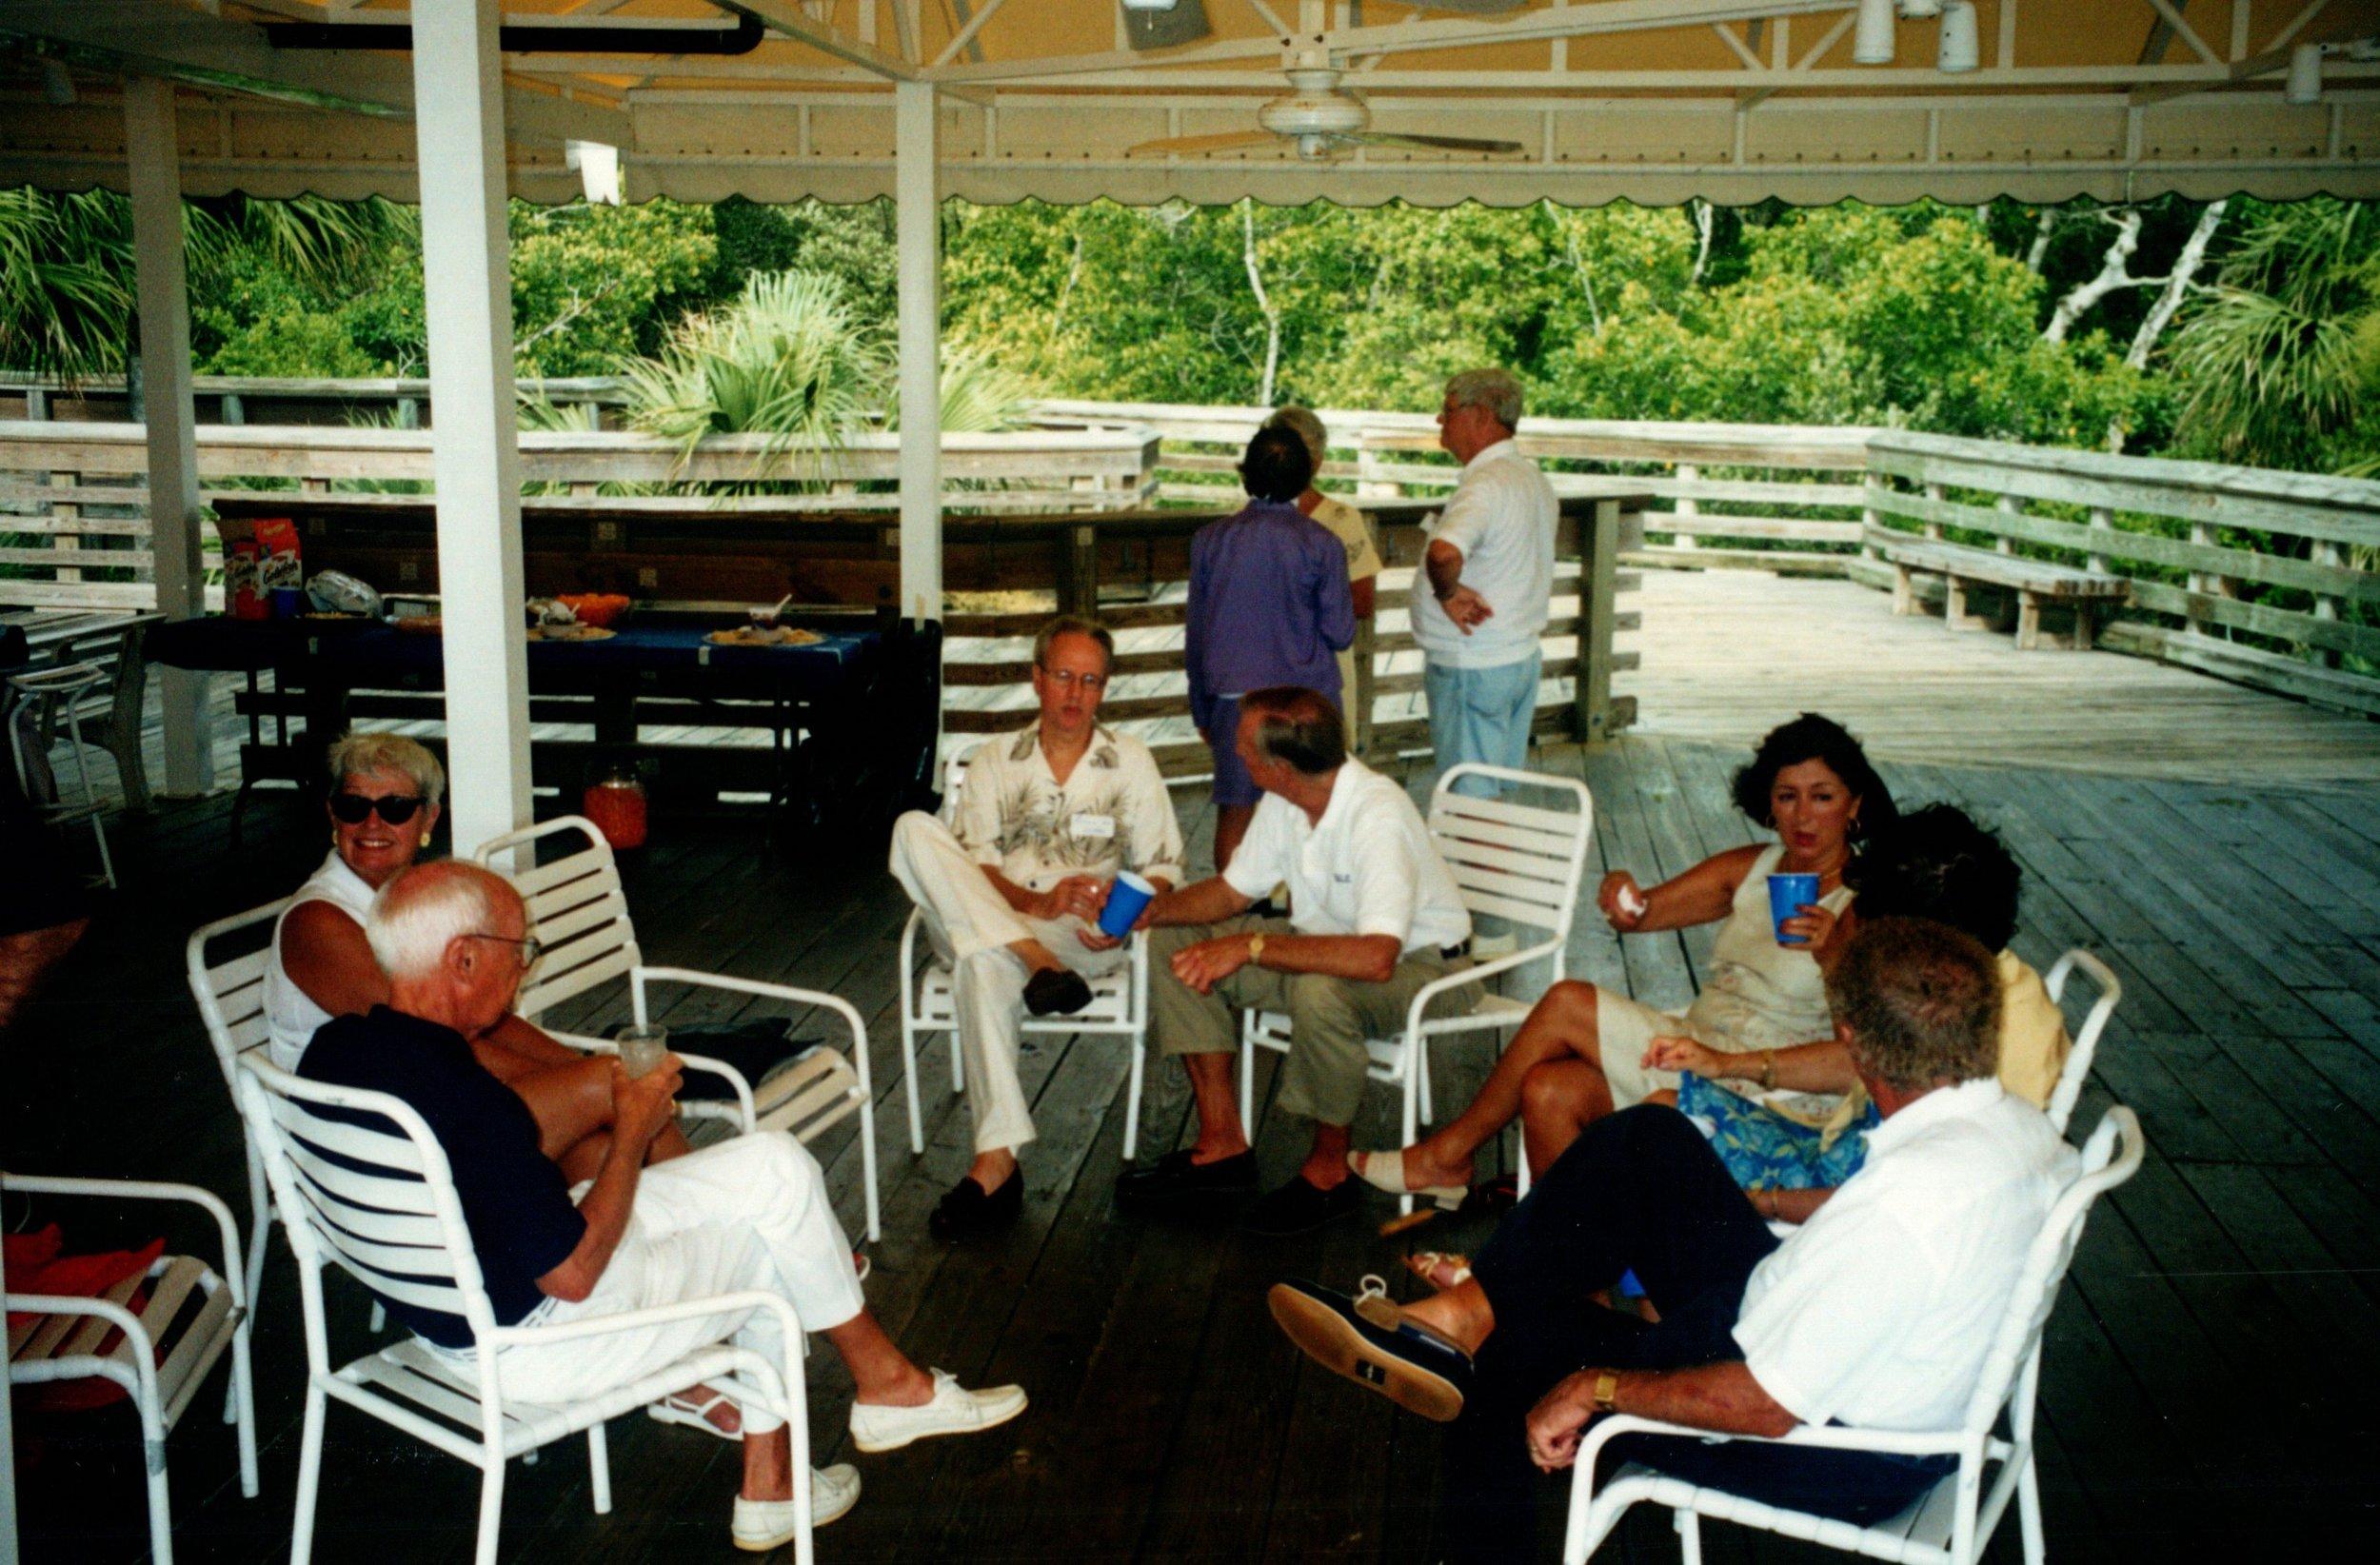 SUMMER PICNIC - SANDPIPER CLUB PELICAN BAY 9.jpg